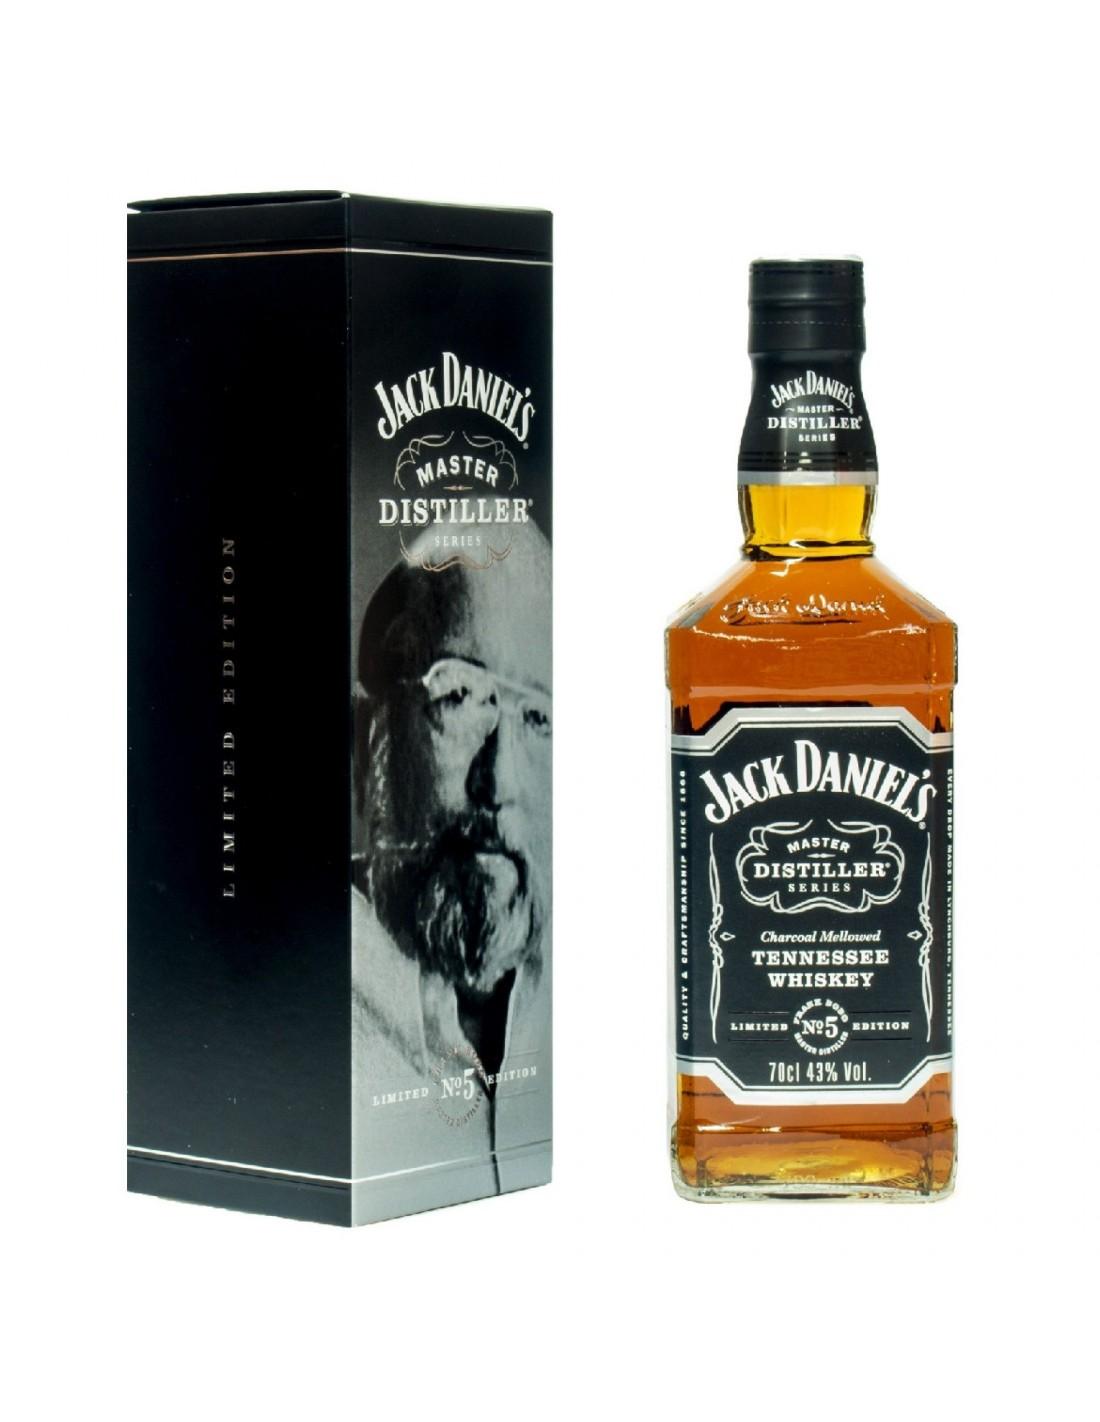 Whisky Bourbon Jack Daniel's Master Distiller No. 5, 43% alc., 0.7L, America